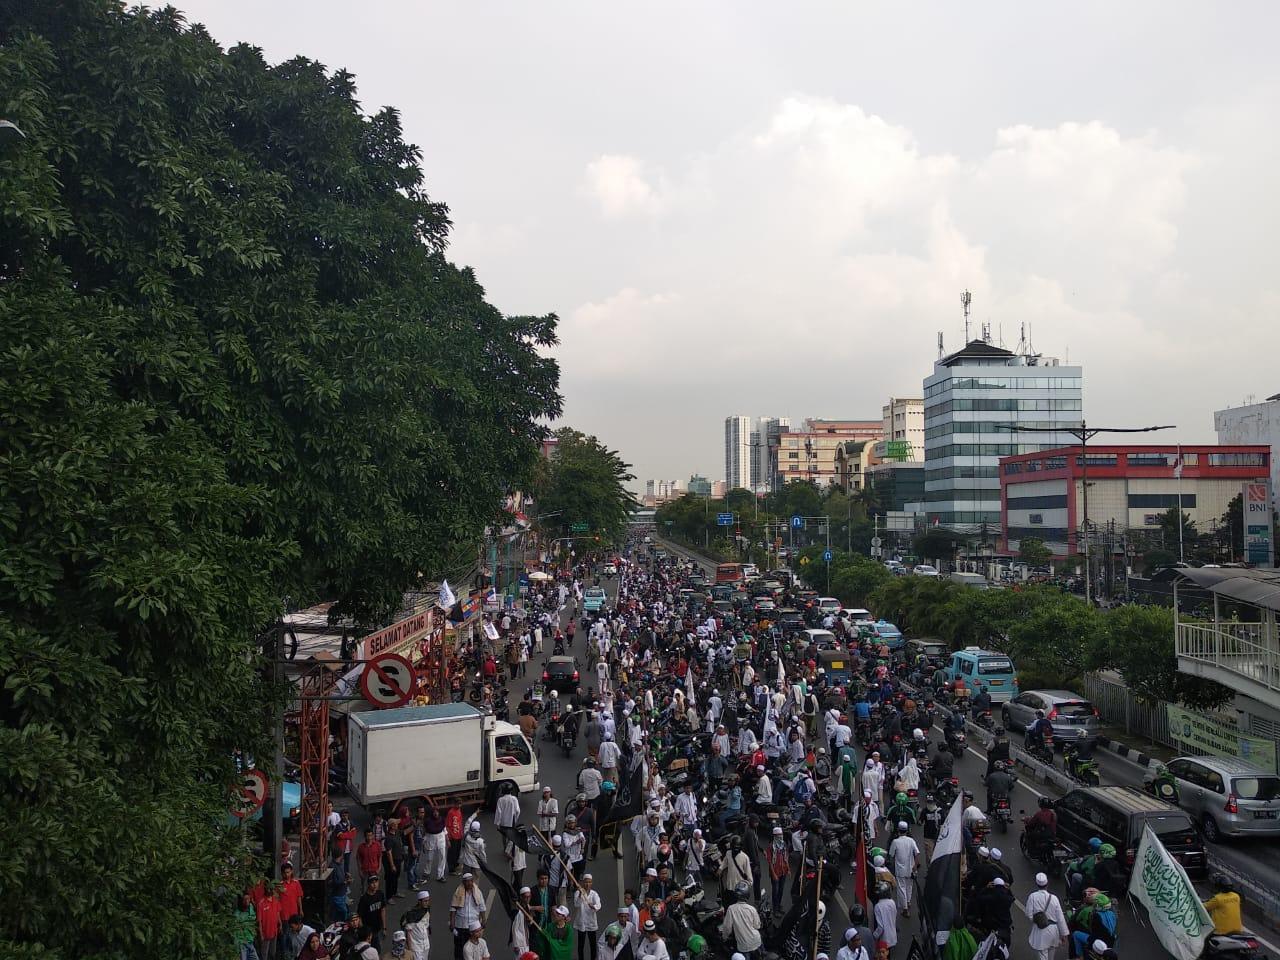 Menko Polhukam Sebut Aksi Bela Tauhid Ditunggangi HTI